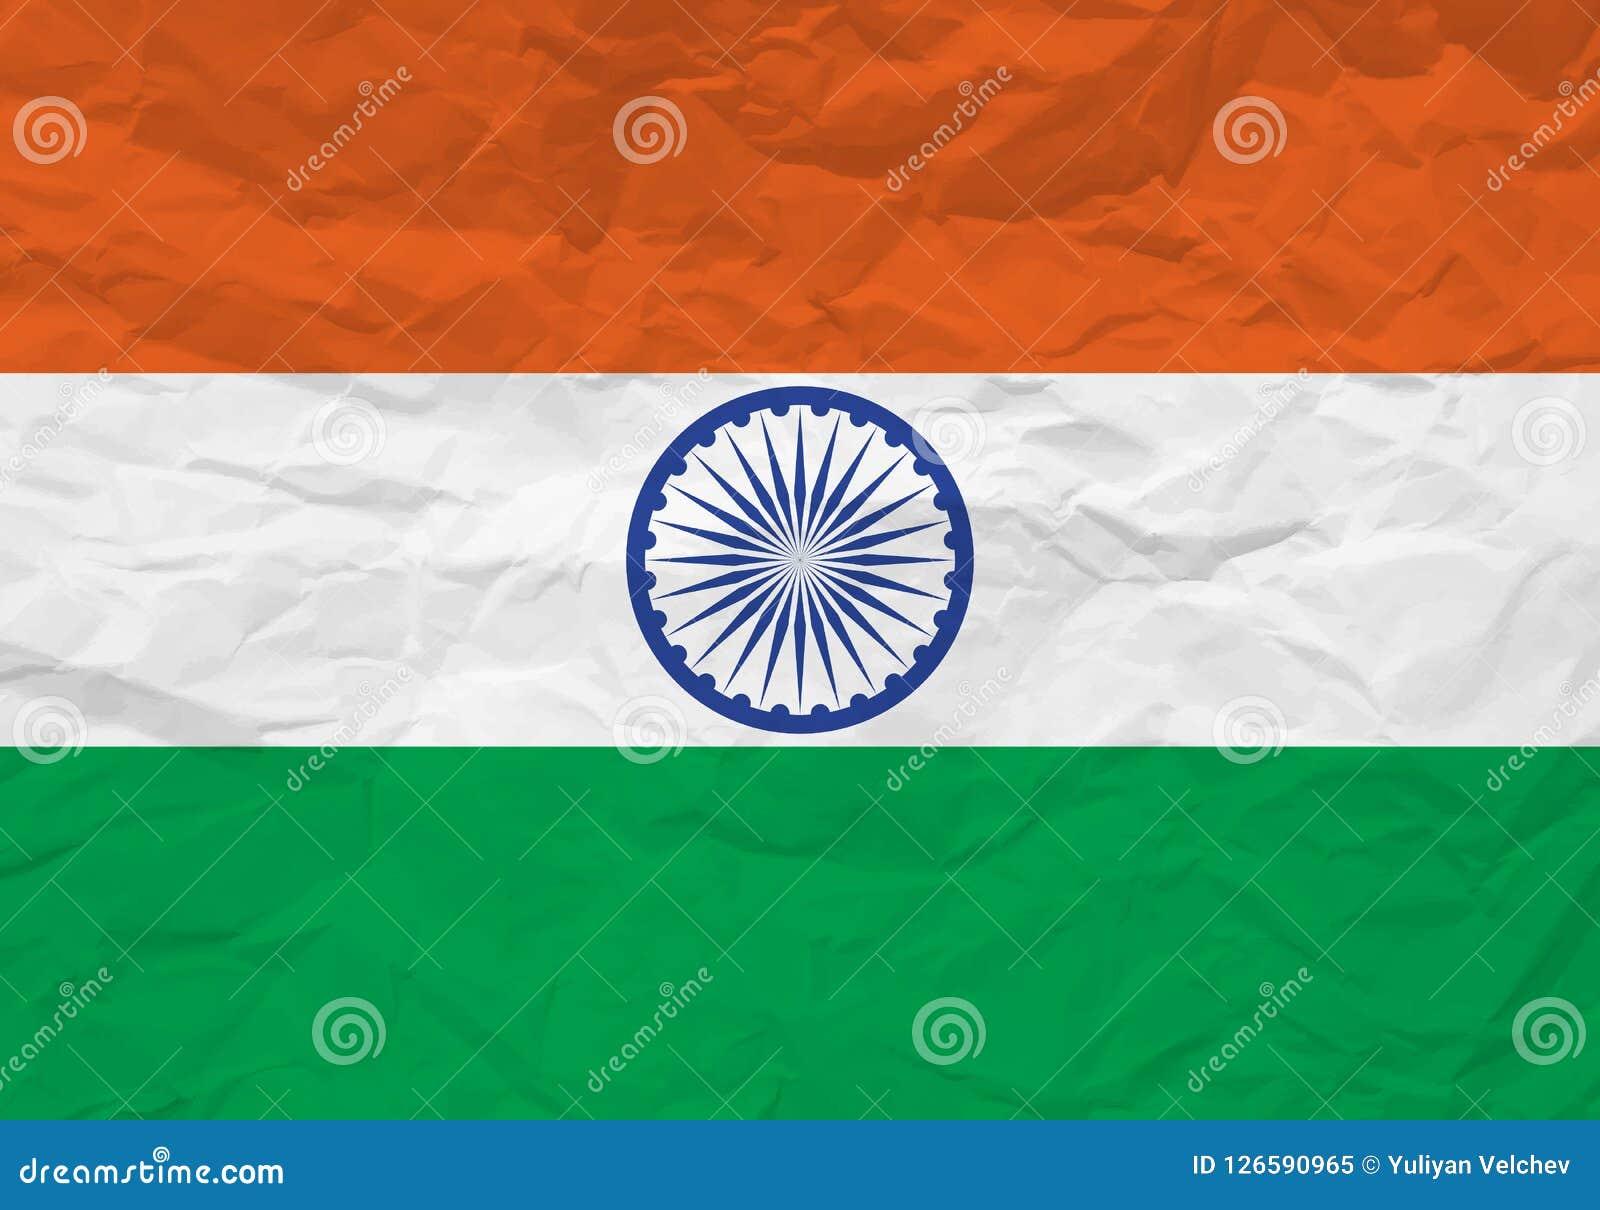 India flag crumpled paper